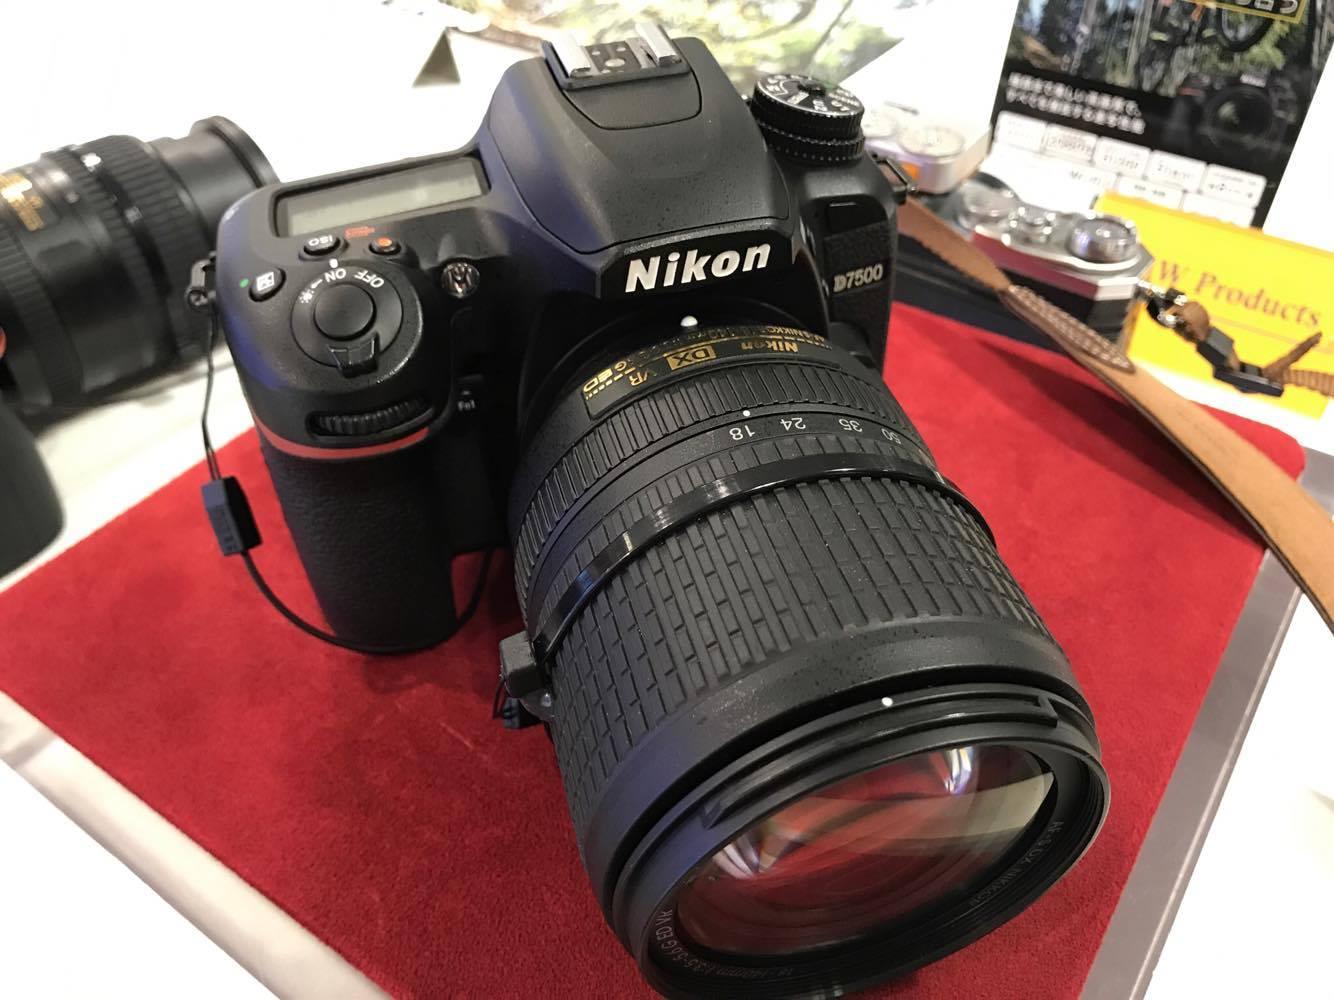 The Nikon D7500 will start shipping on June 9th - Nikon Rumors